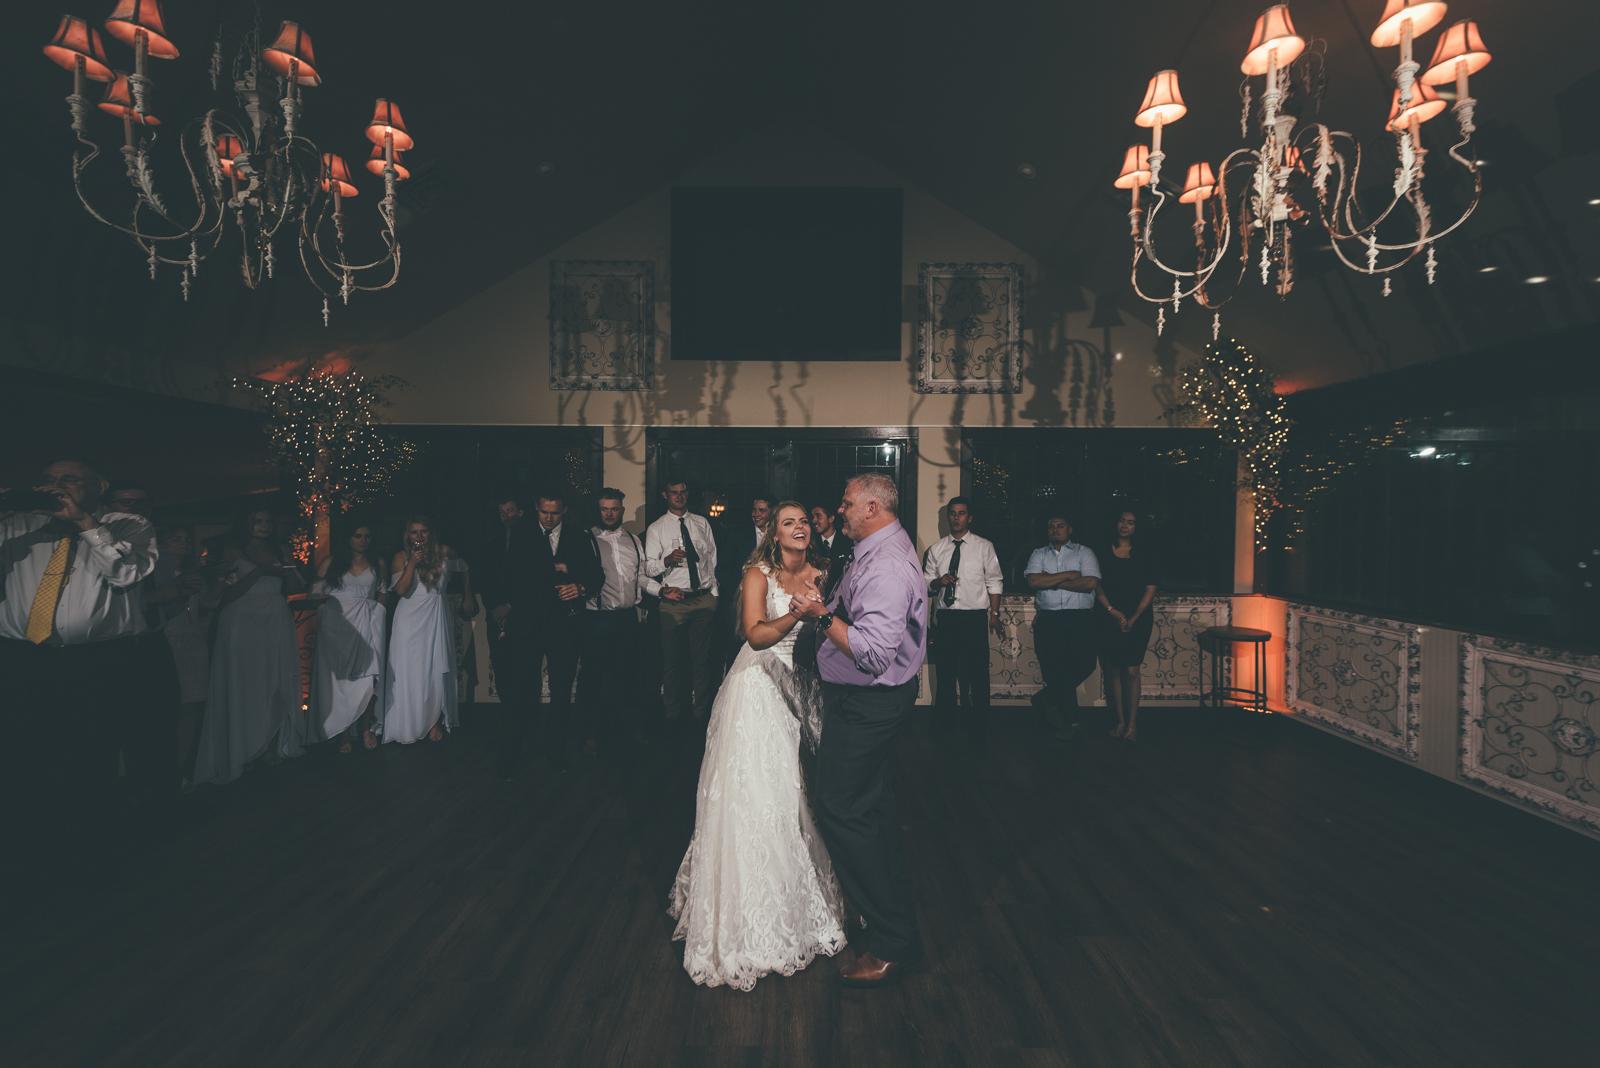 ChadFahnestockPhotography-na-honeymoon-031.jpg